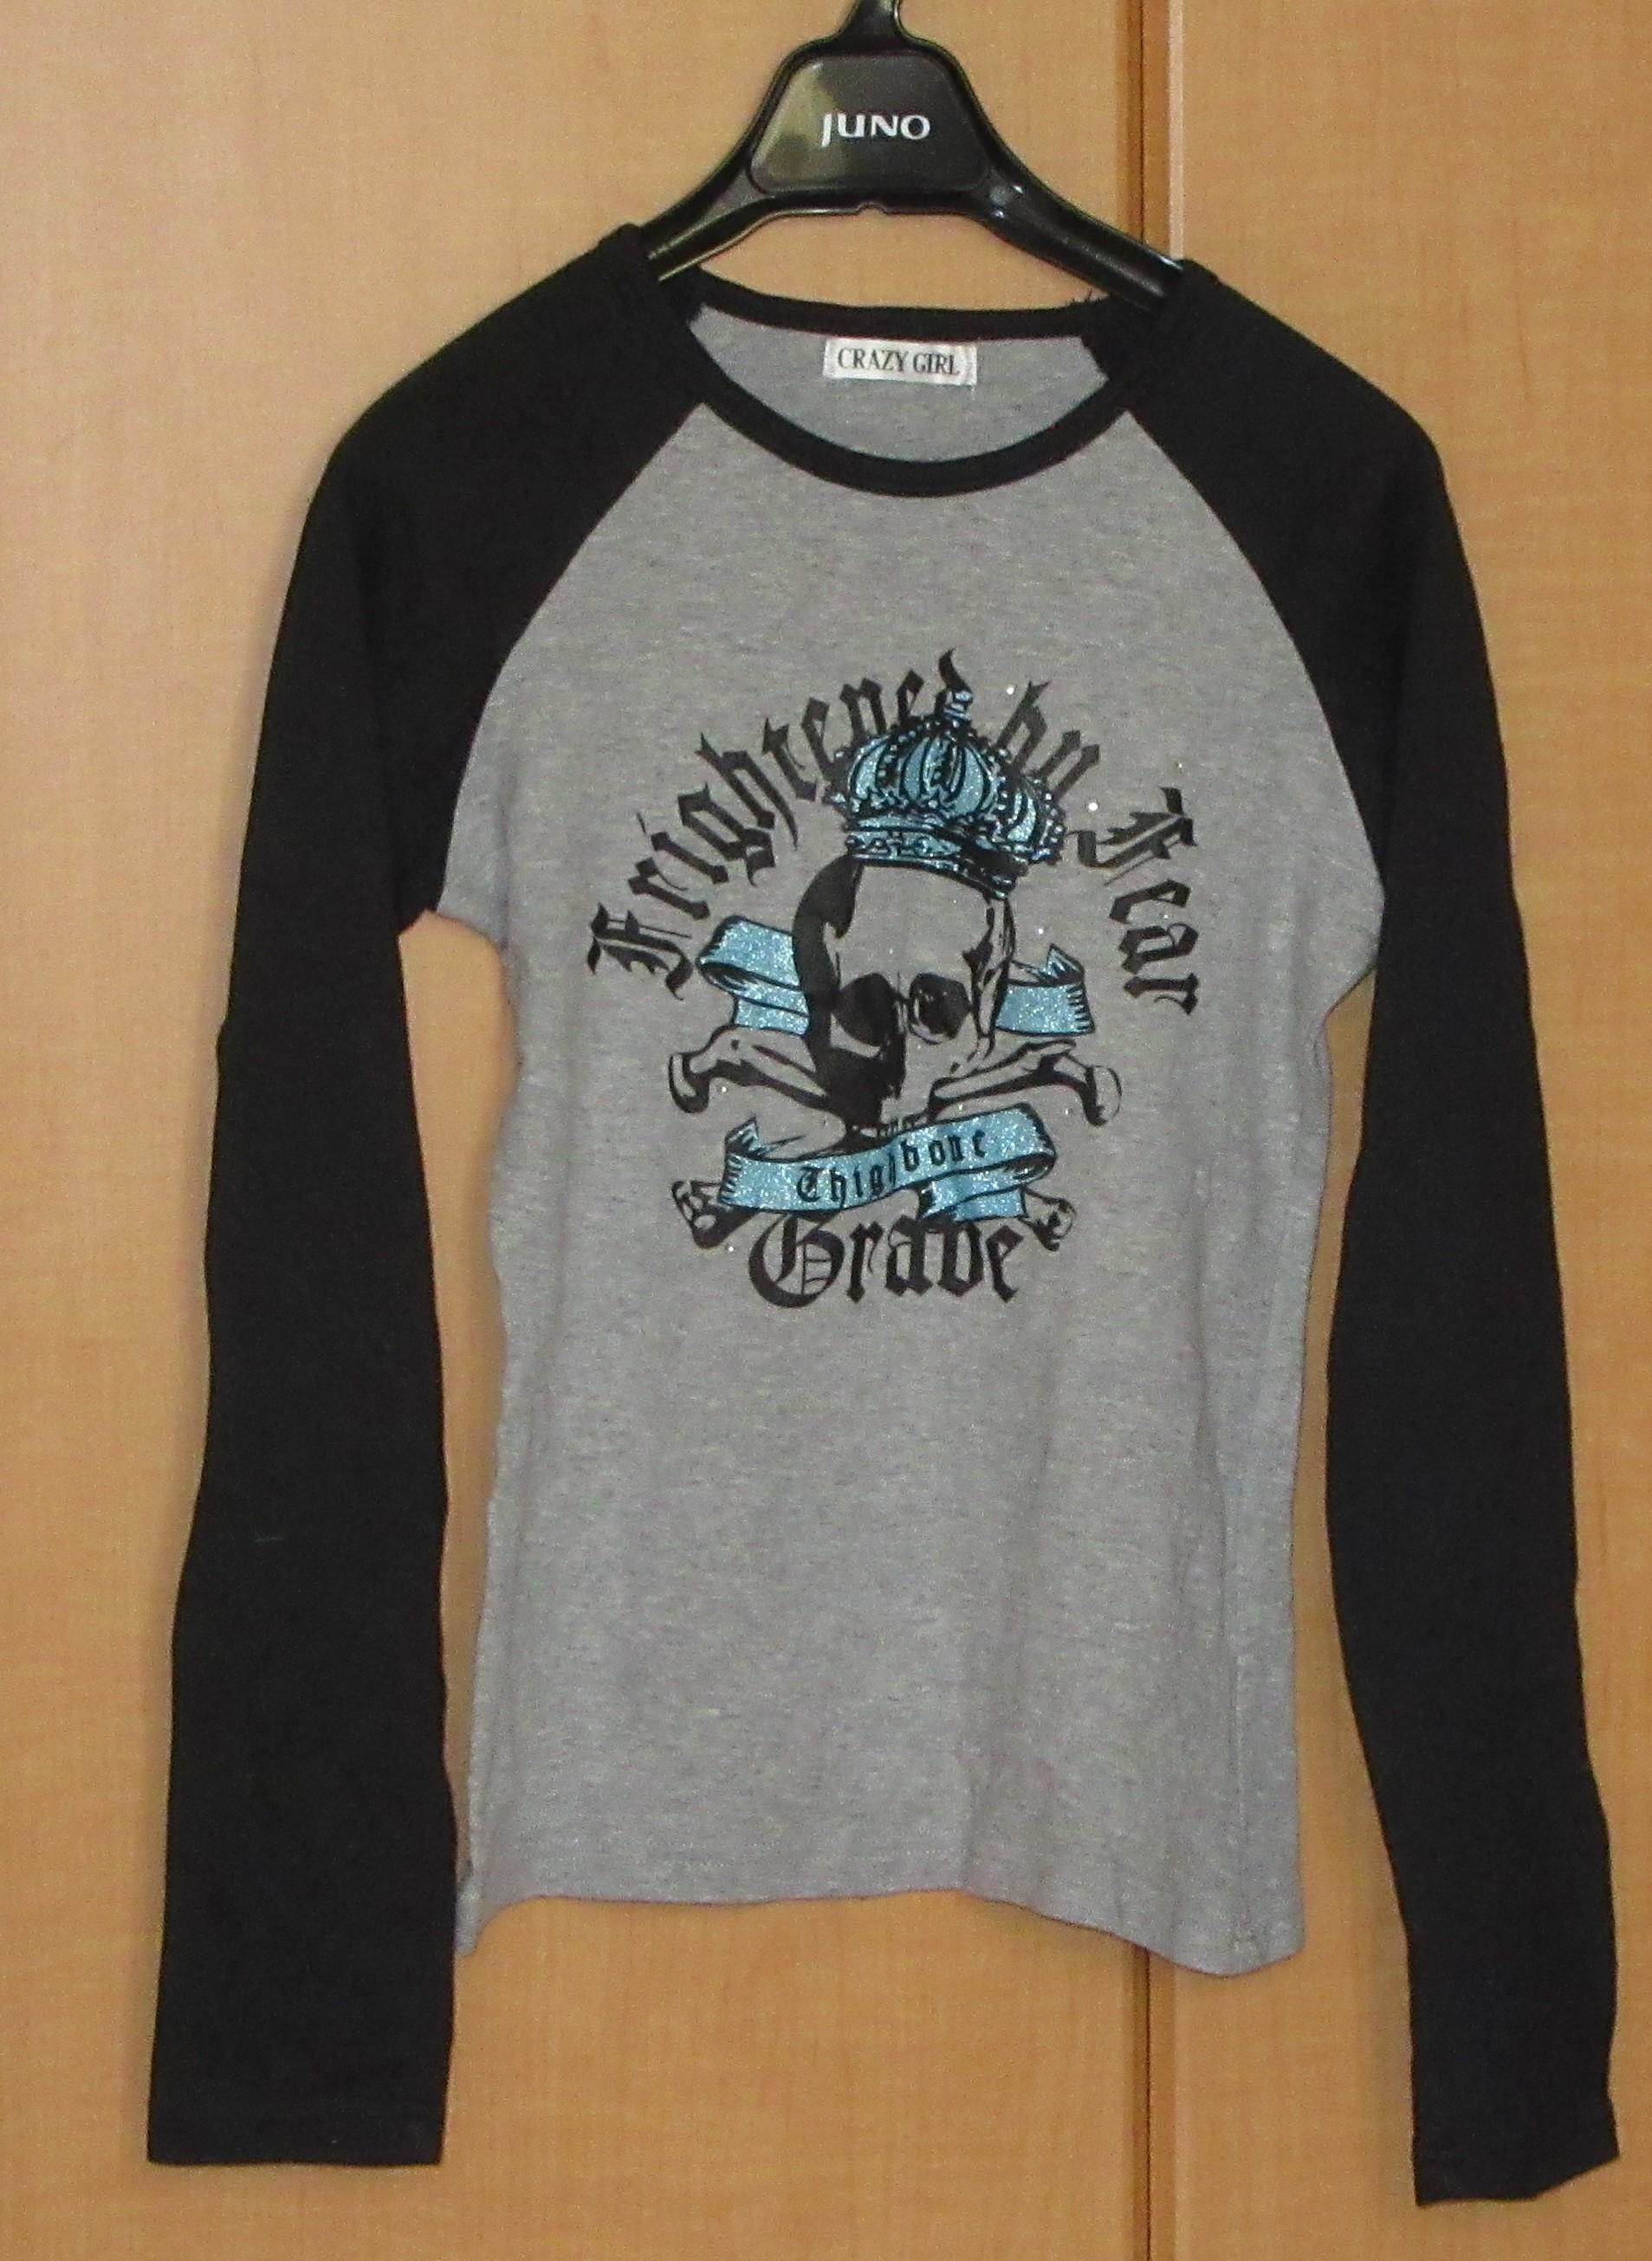 Tシャツ ドクロ CRAZY GIRL リセール商品